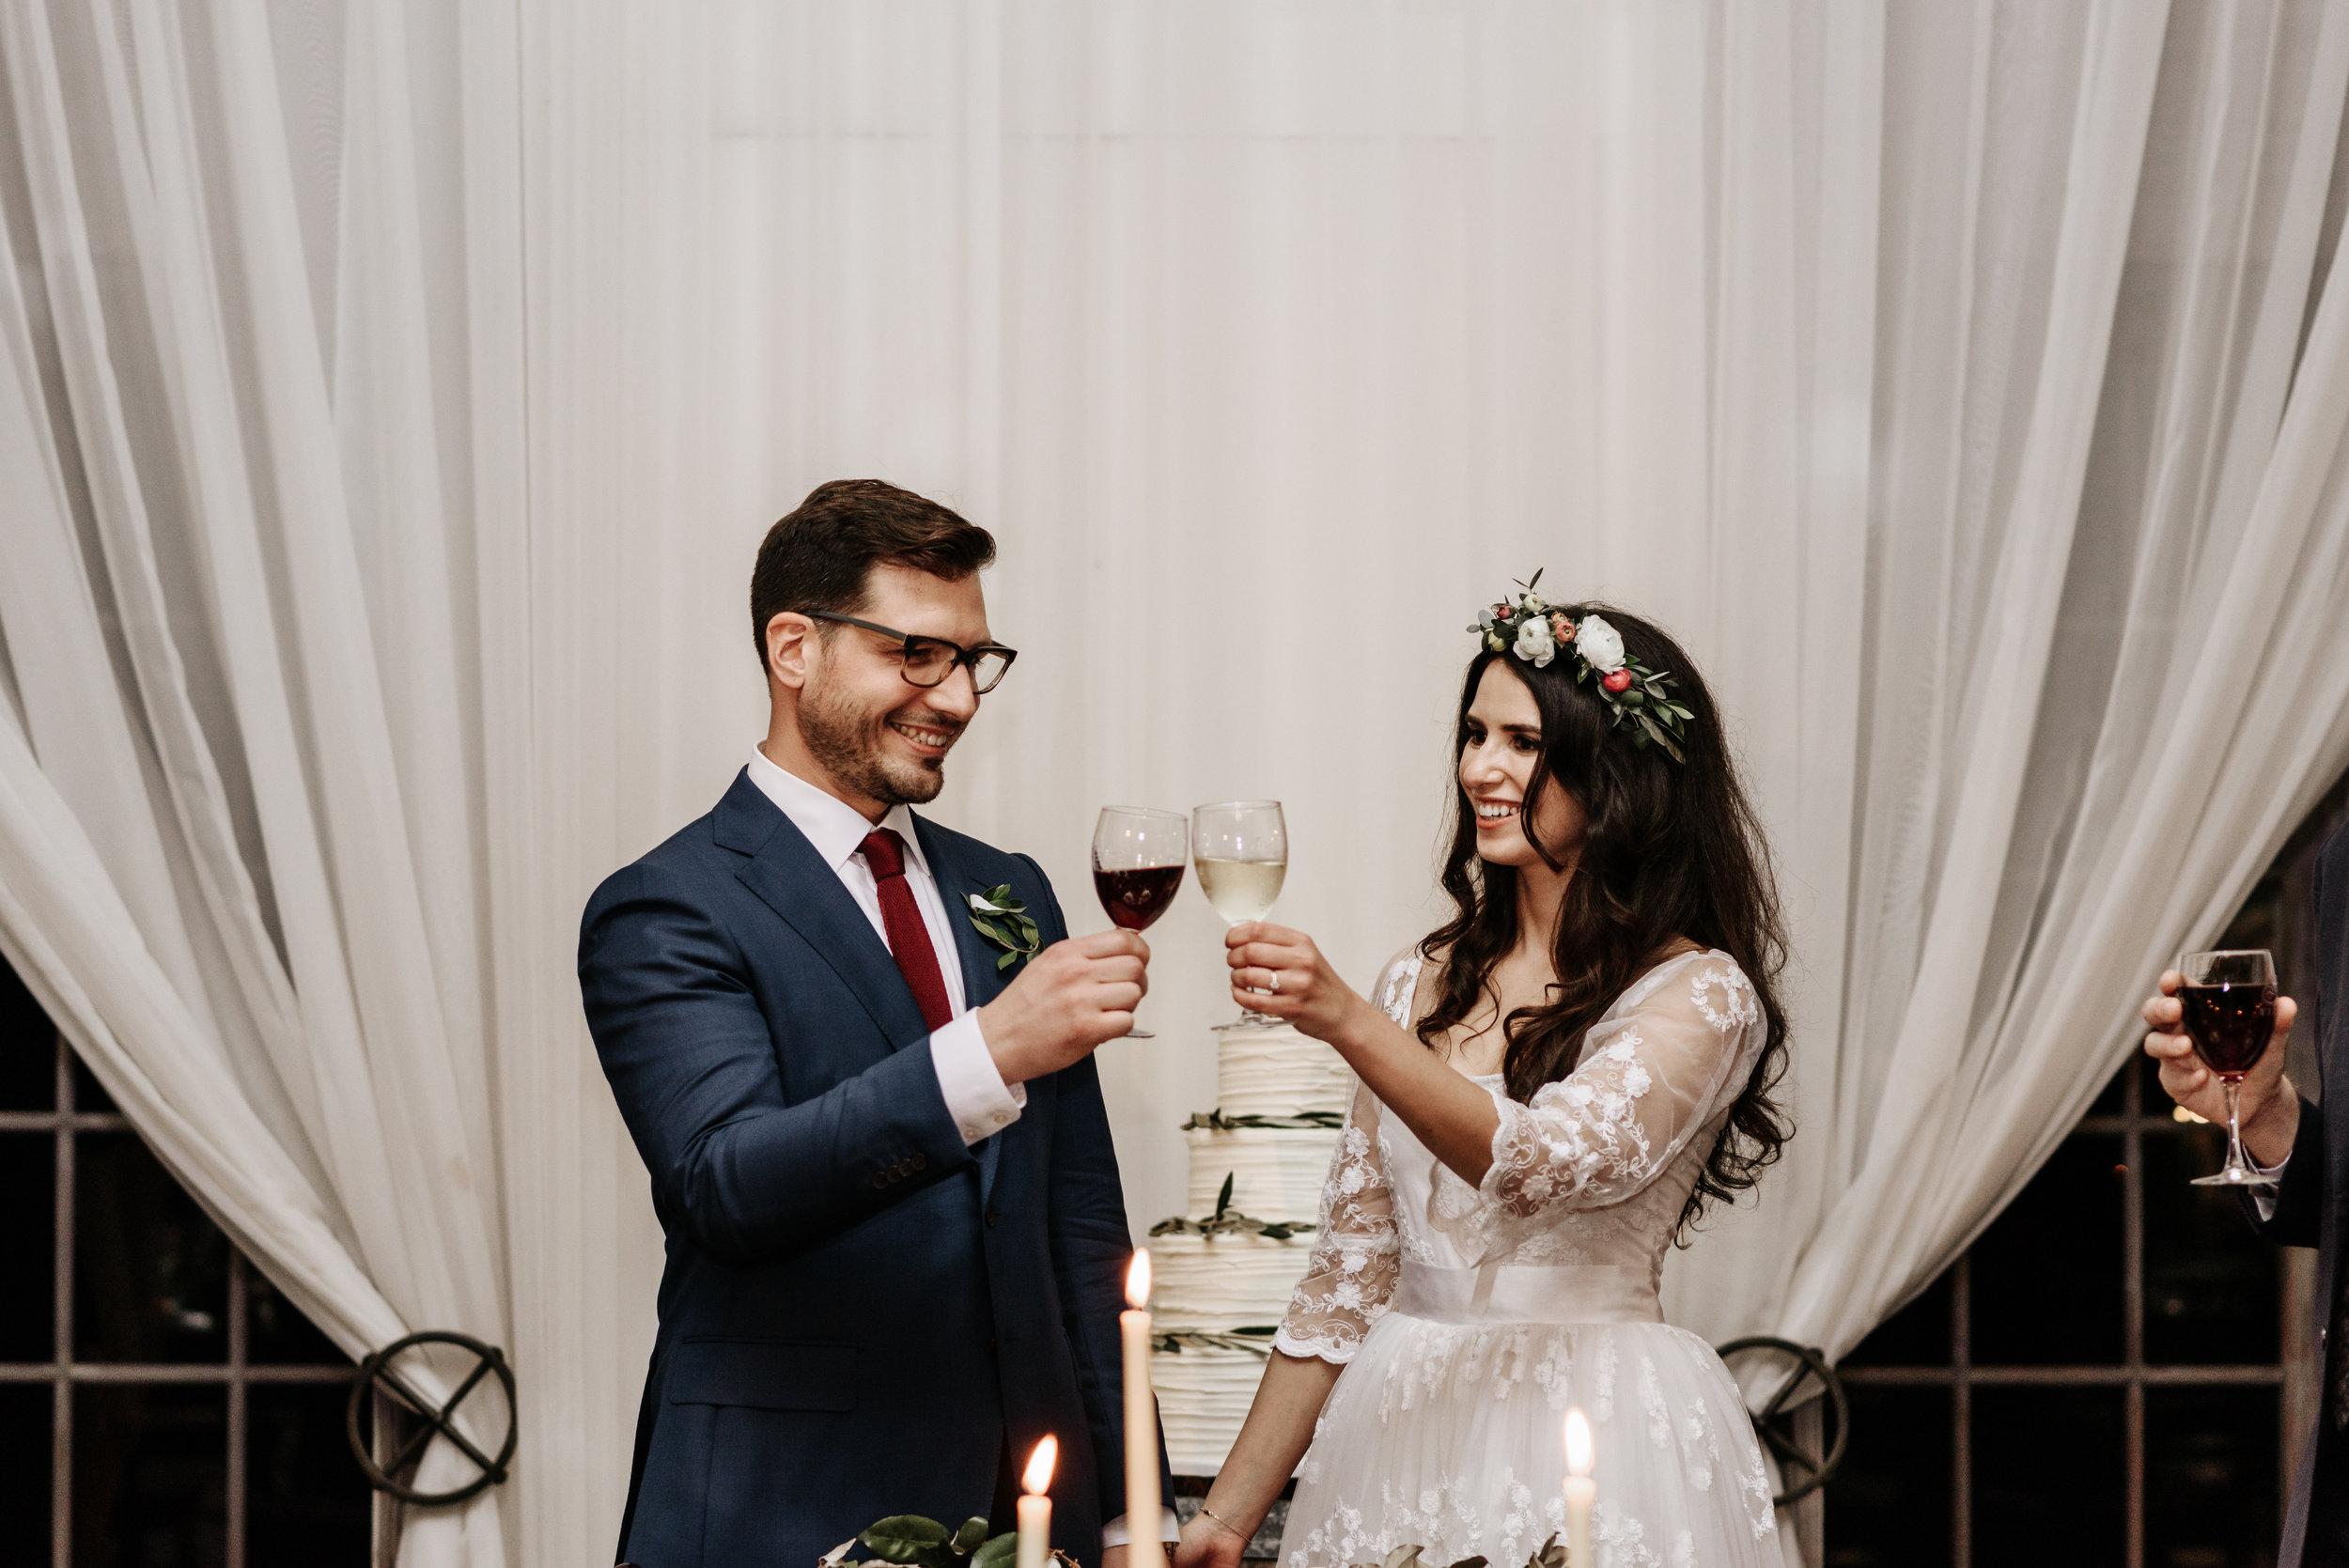 Veritas-Vineyards-and-Winery-Wedding-Photography-Afton-Virginia-Yasmin-Seth-Photography-by-V-3109.jpg